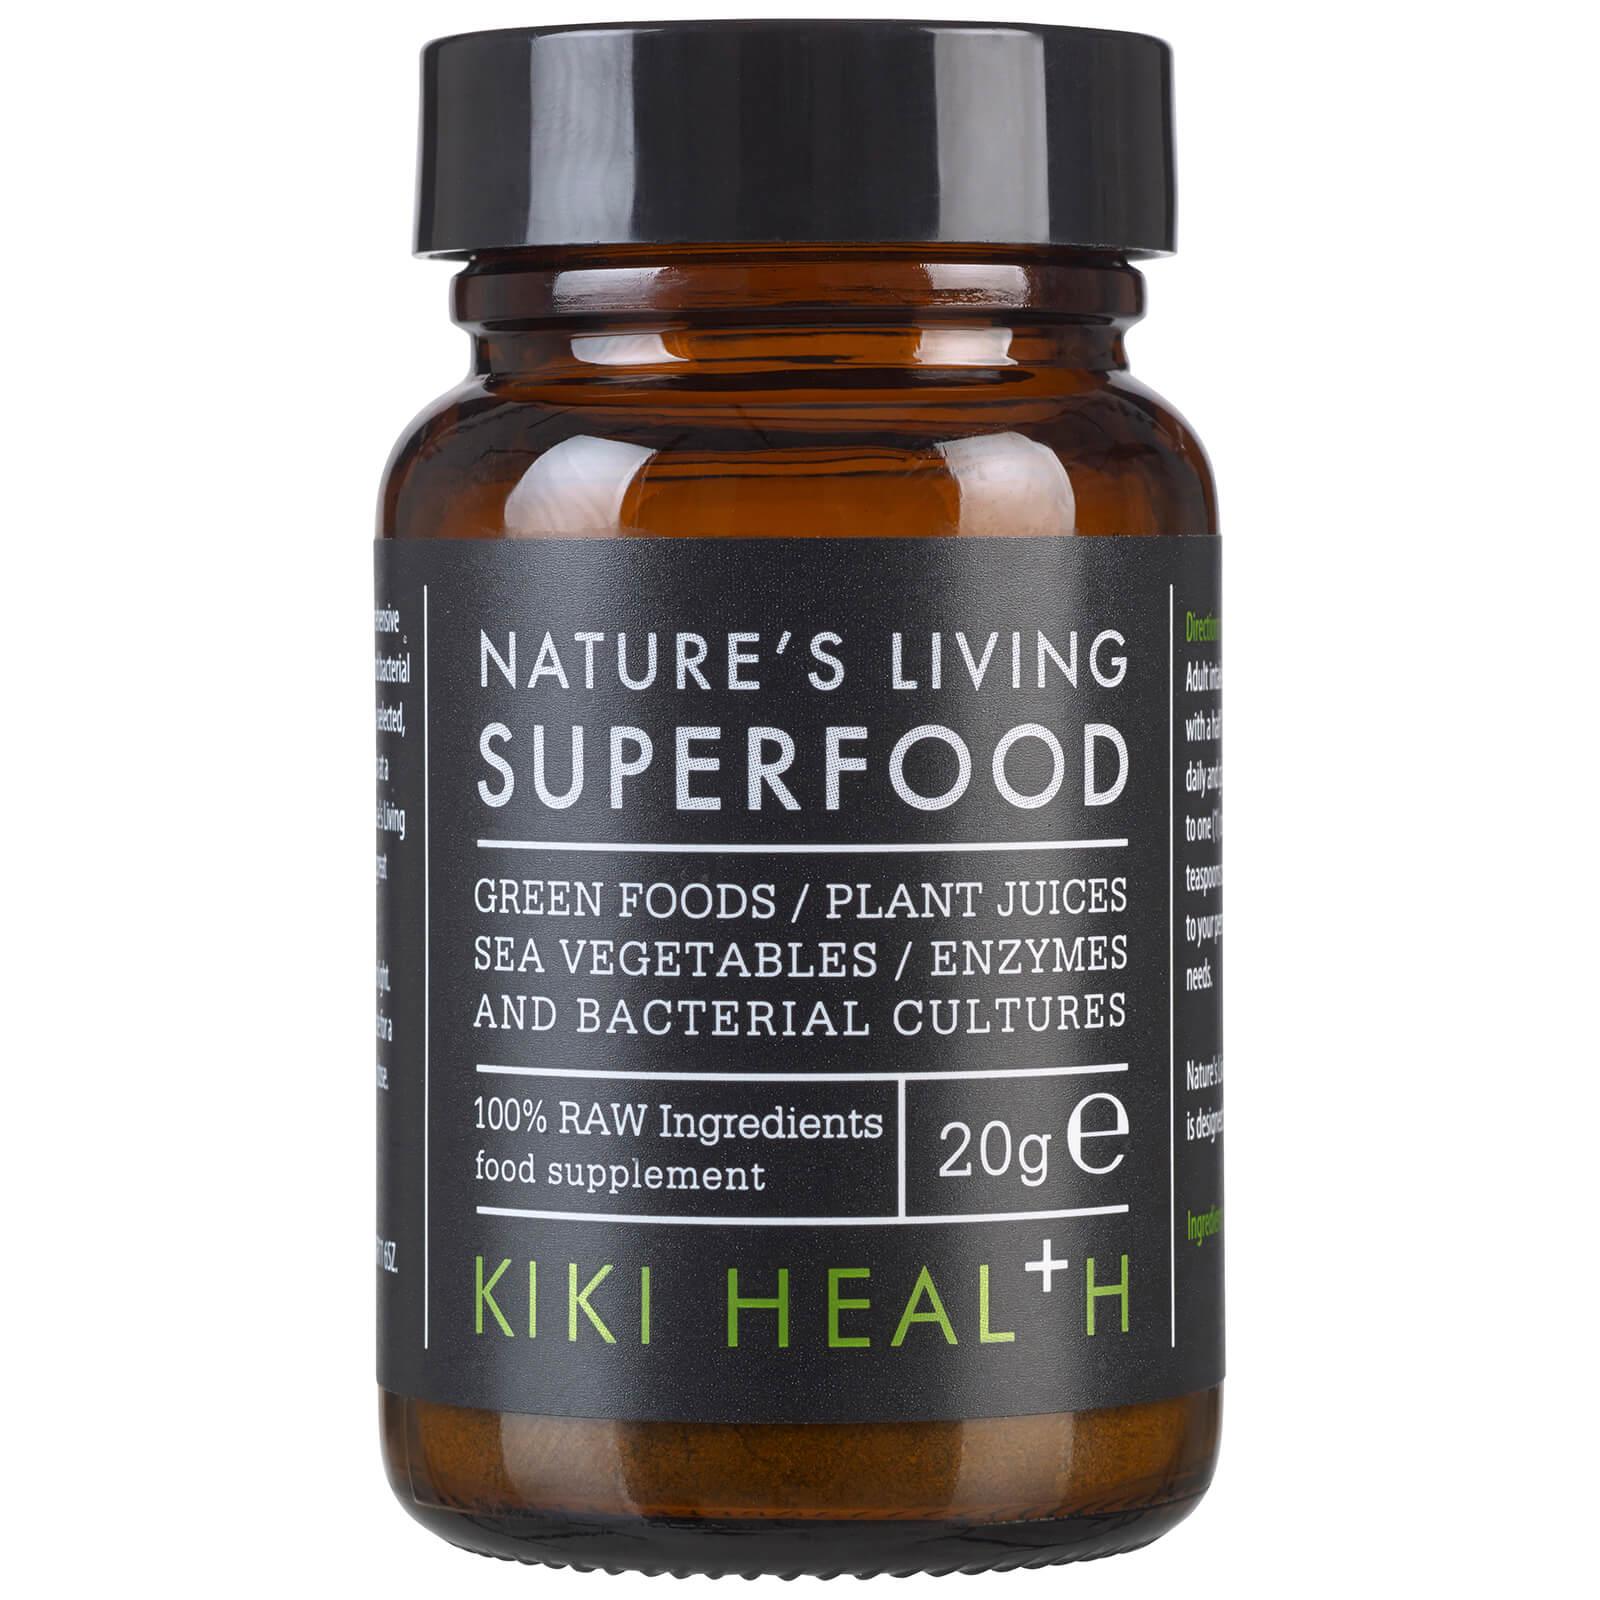 KIKI Health Nature's Living Superfood integratore biologico 20 g